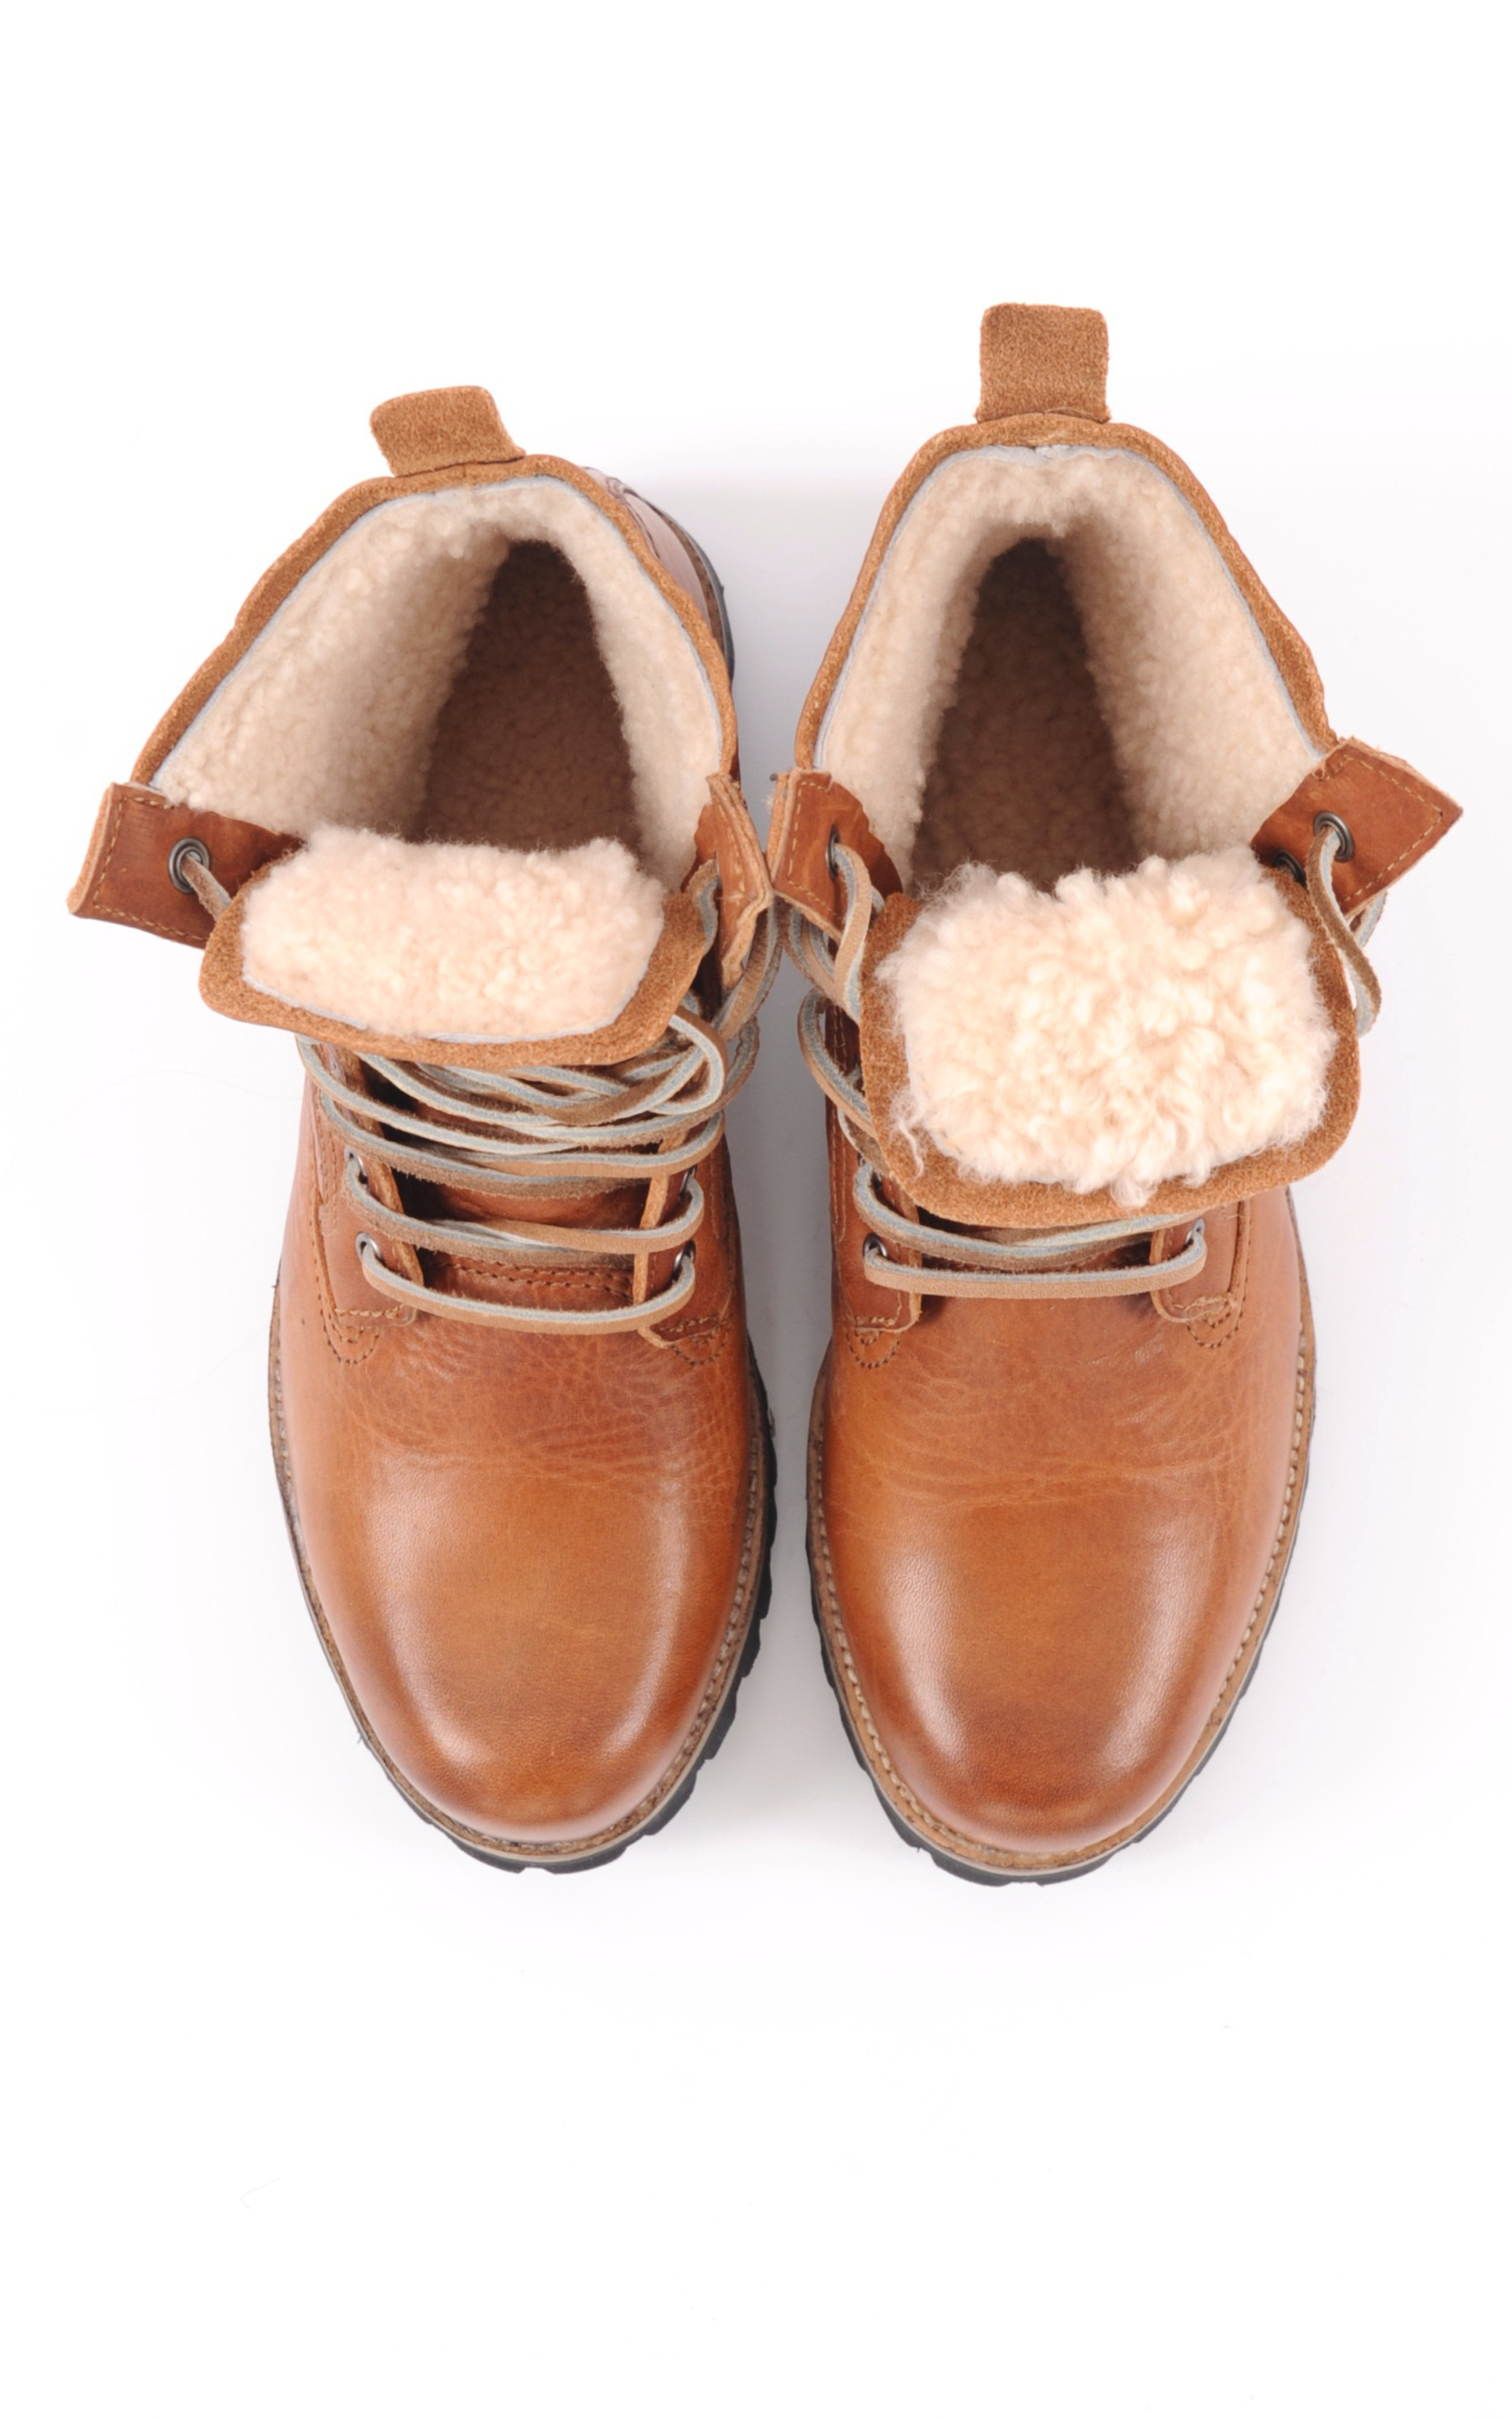 Boots Cuir Cognac Femme Blackstone